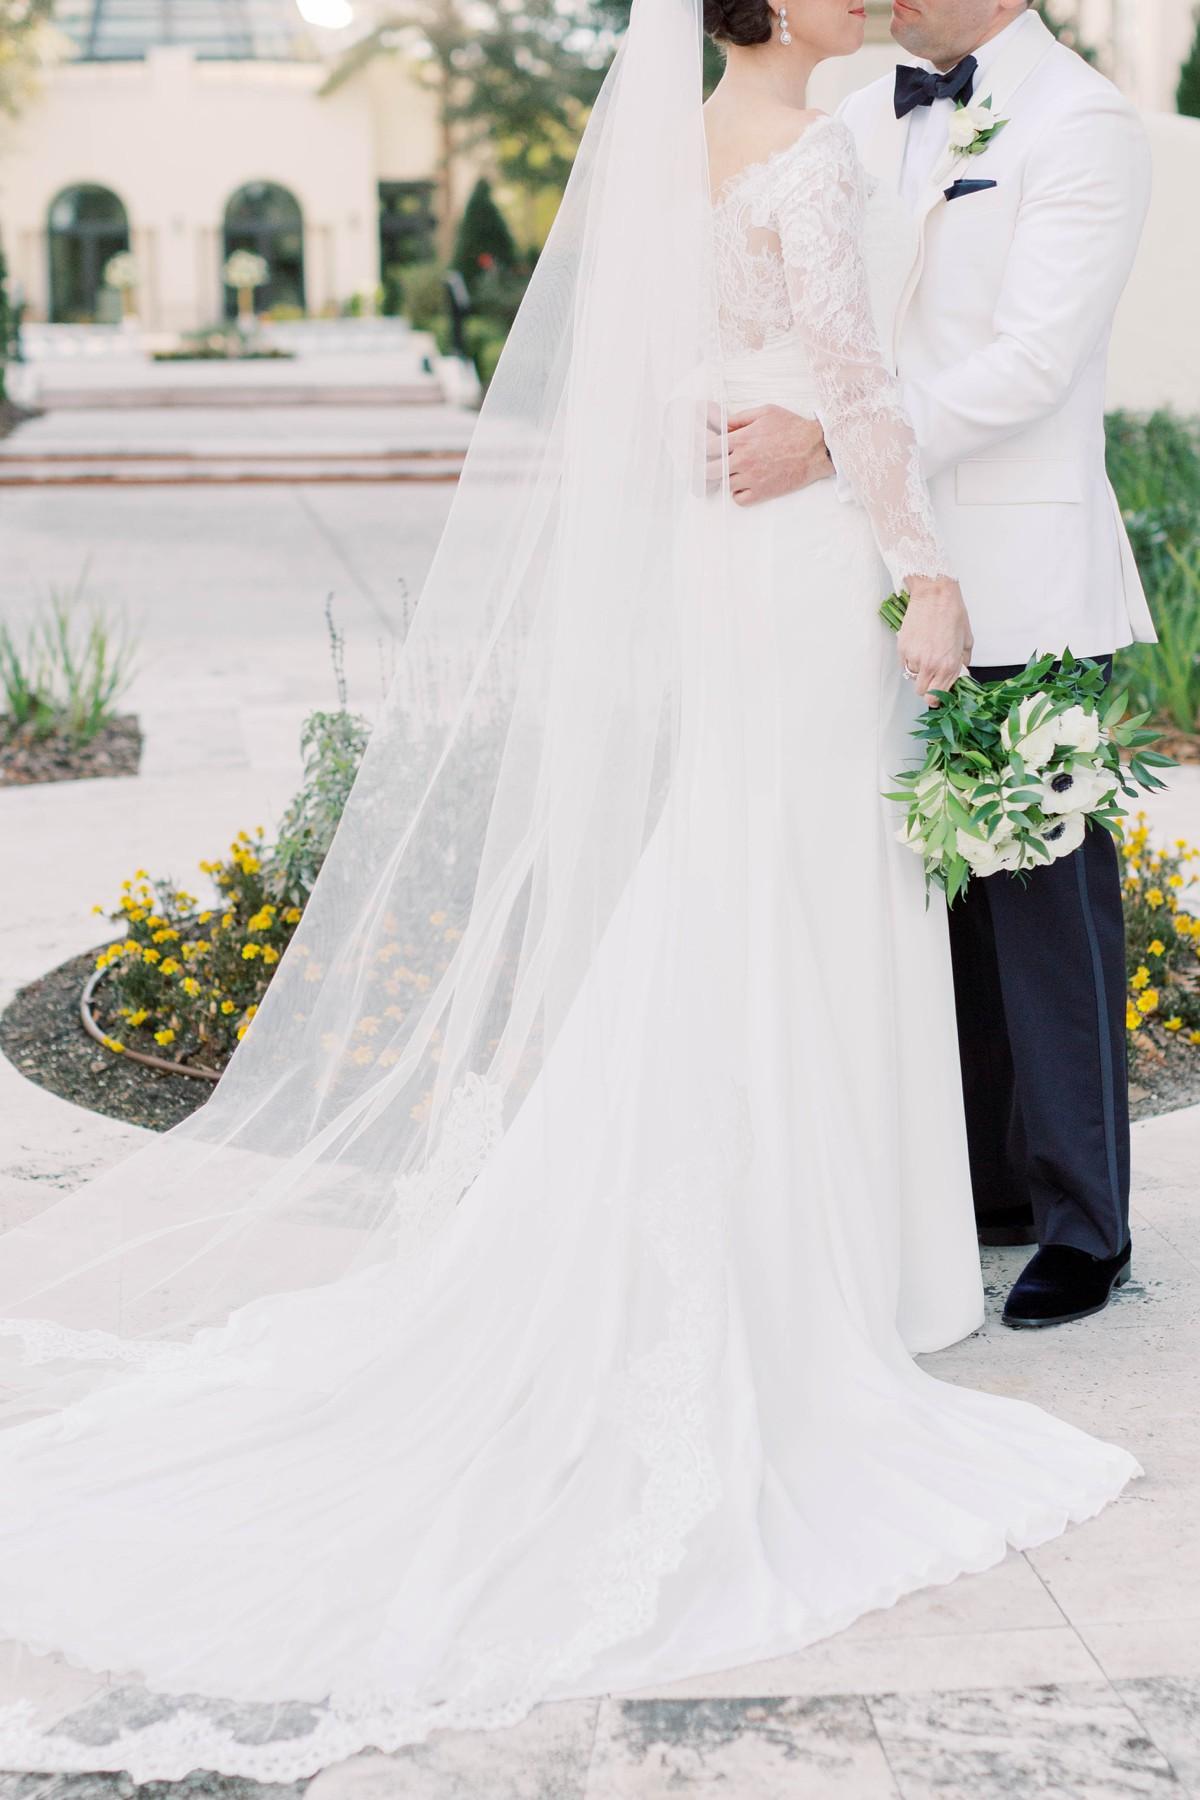 Alfond-Inn-Wedding-Winter-Park-Wedding-Photographer-Chantell-Rae-Photography_0016.jpg